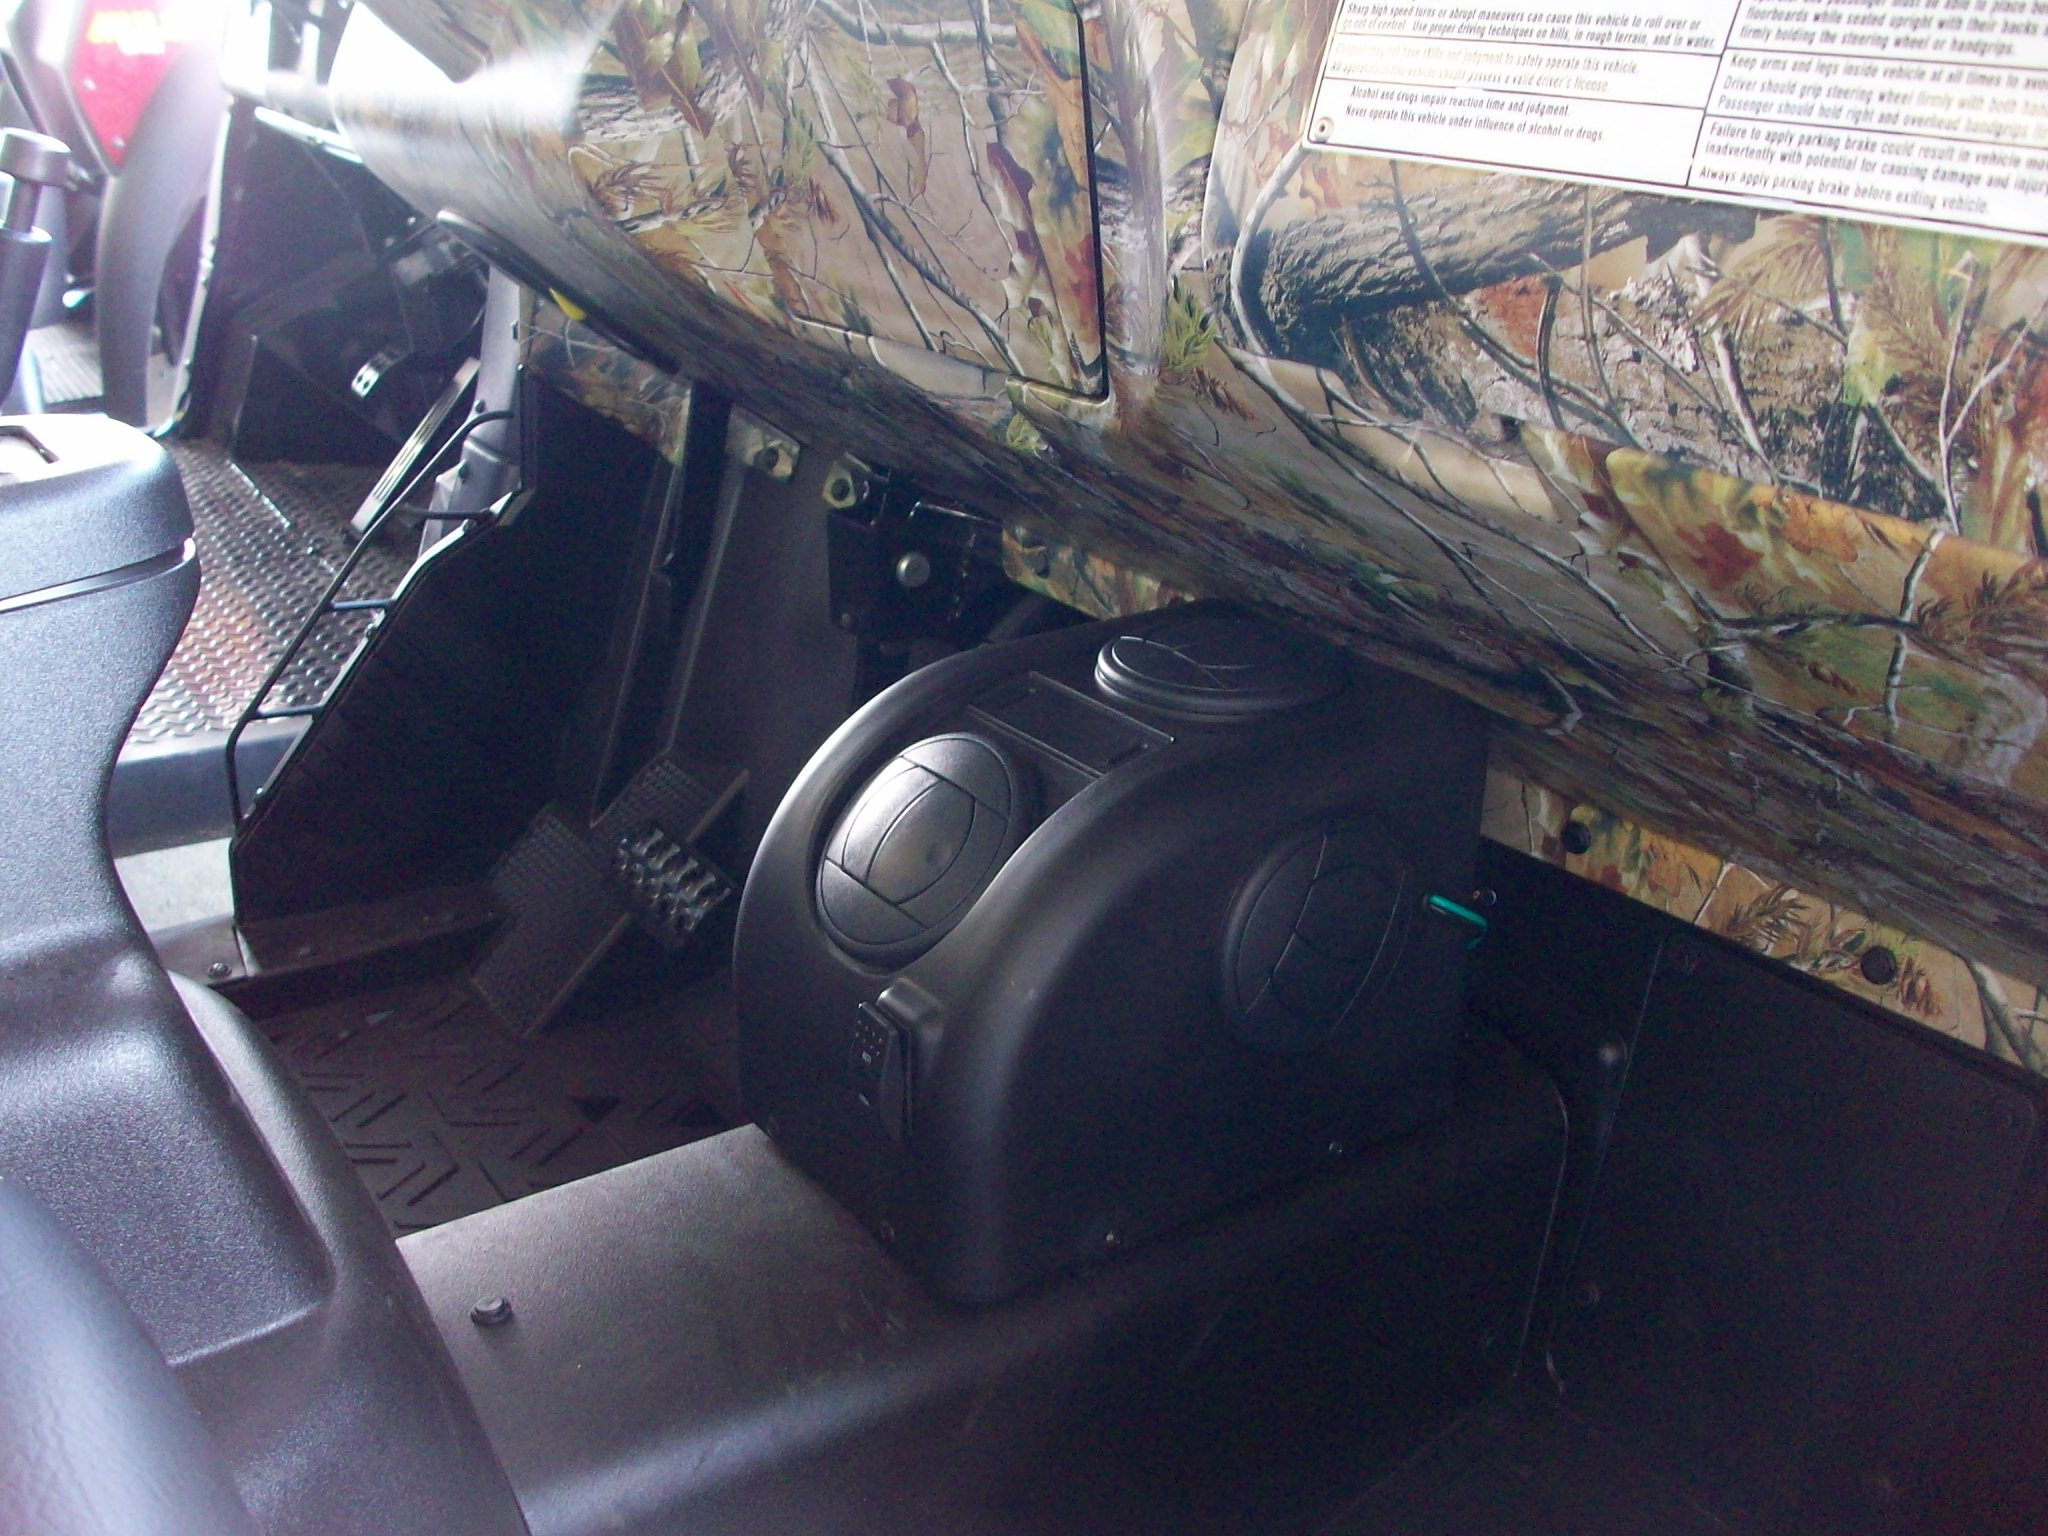 New Motoalliance Cab Heaters / $100 off sale - Kawasaki Teryx Forum